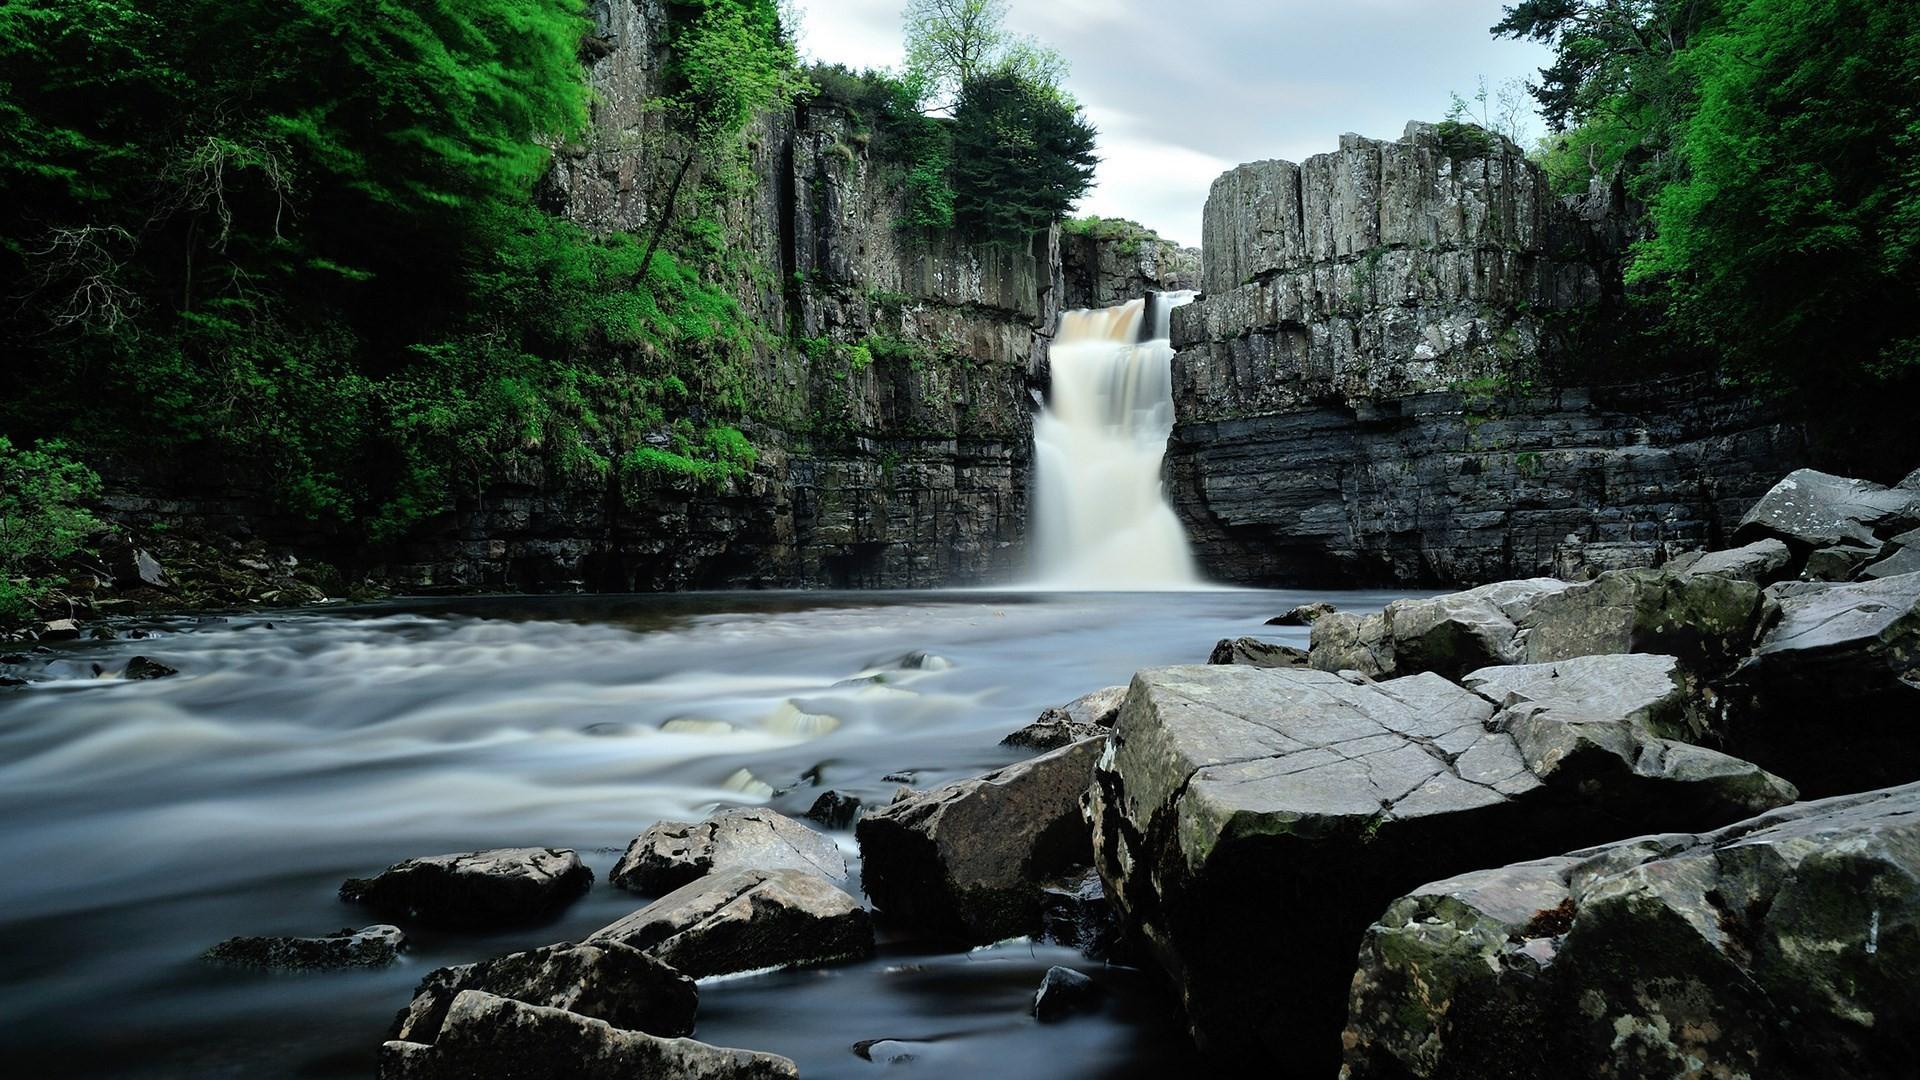 hd waterfall wallpaper. Â«Â«